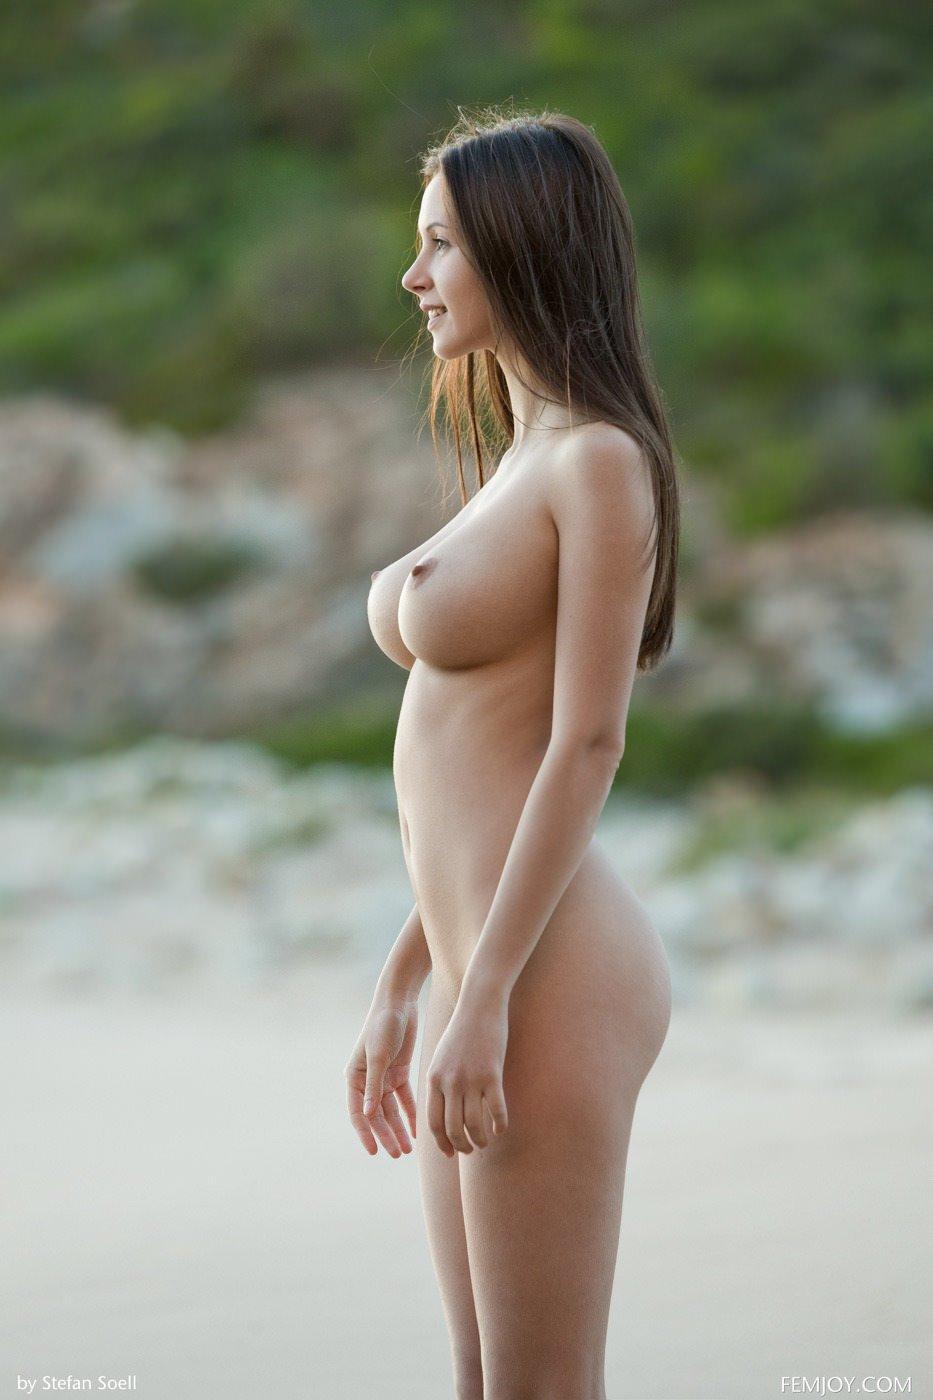 tumblr_p8saot6sIh1r5rcpjo1_1280.jpg -  Link in topic Babes by Rocketman